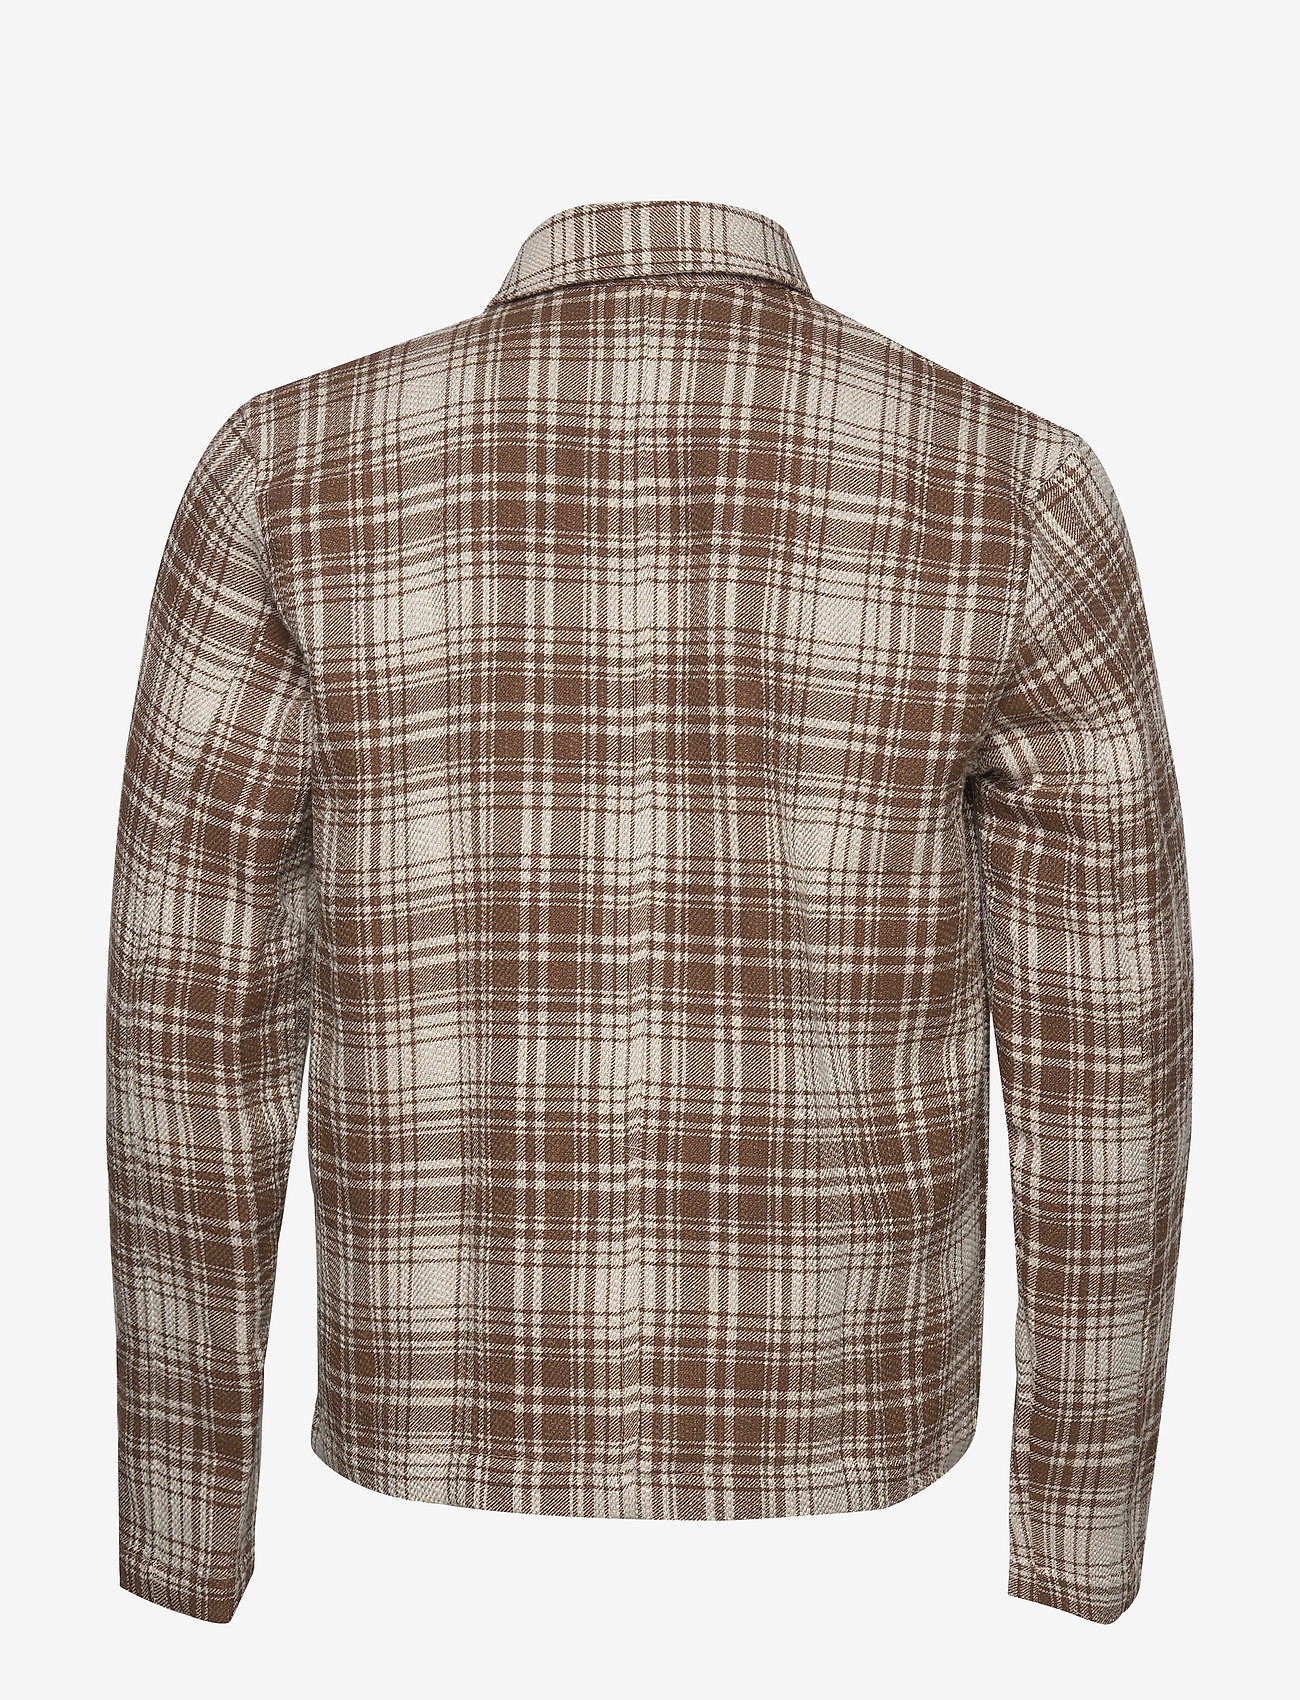 Milano Jacket 11480 (Monks Robe Ch.) - Samsøe Samsøe NKSR8b